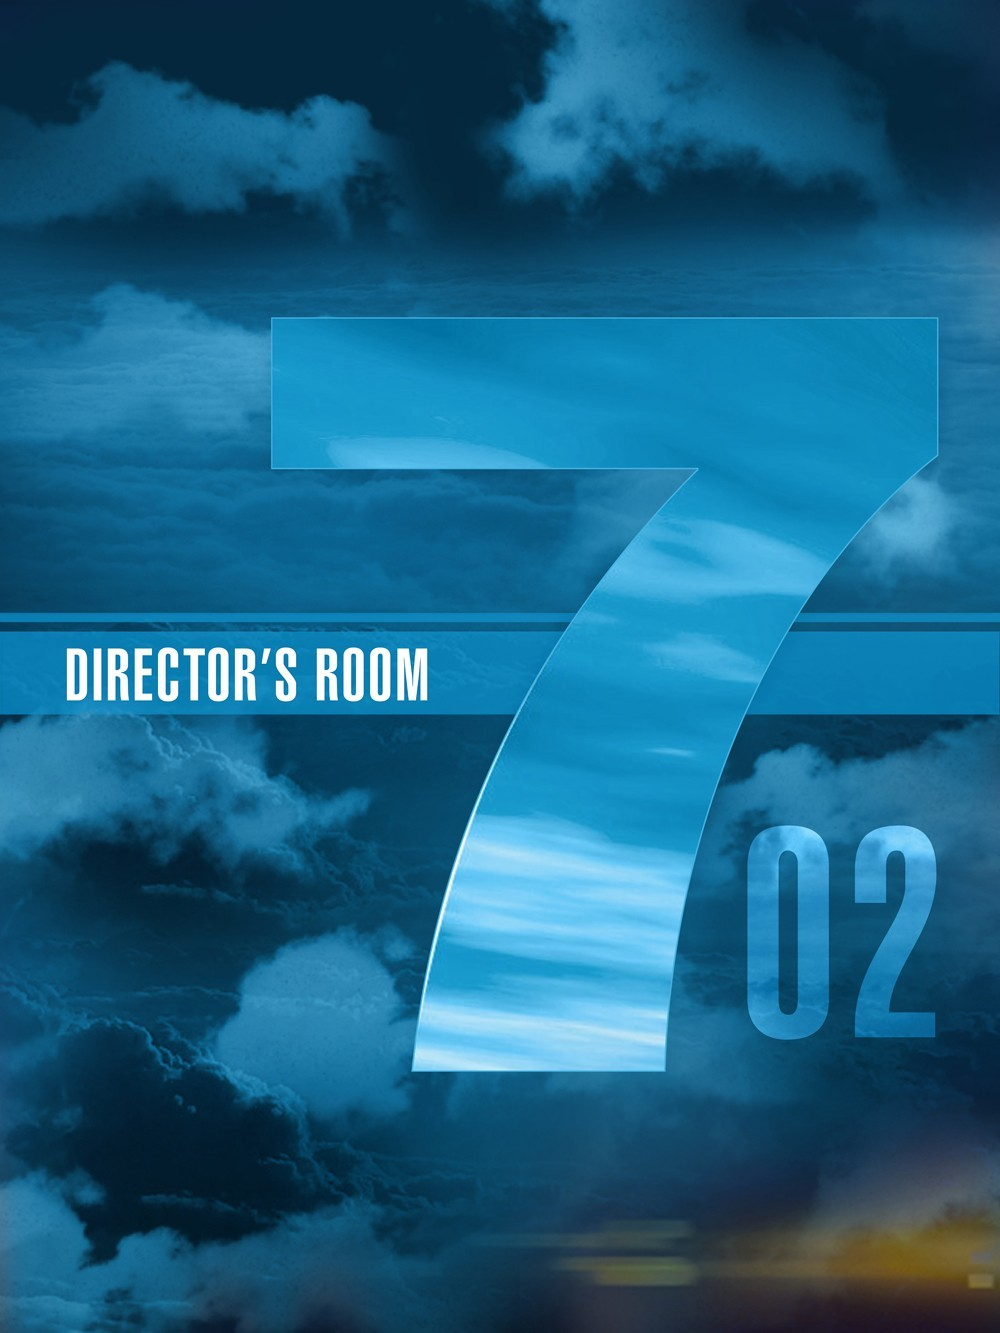 Mohammx nidal khan director room door 1d & Mohammad Nidal Khan - 7thSky Productions - Interior Designs